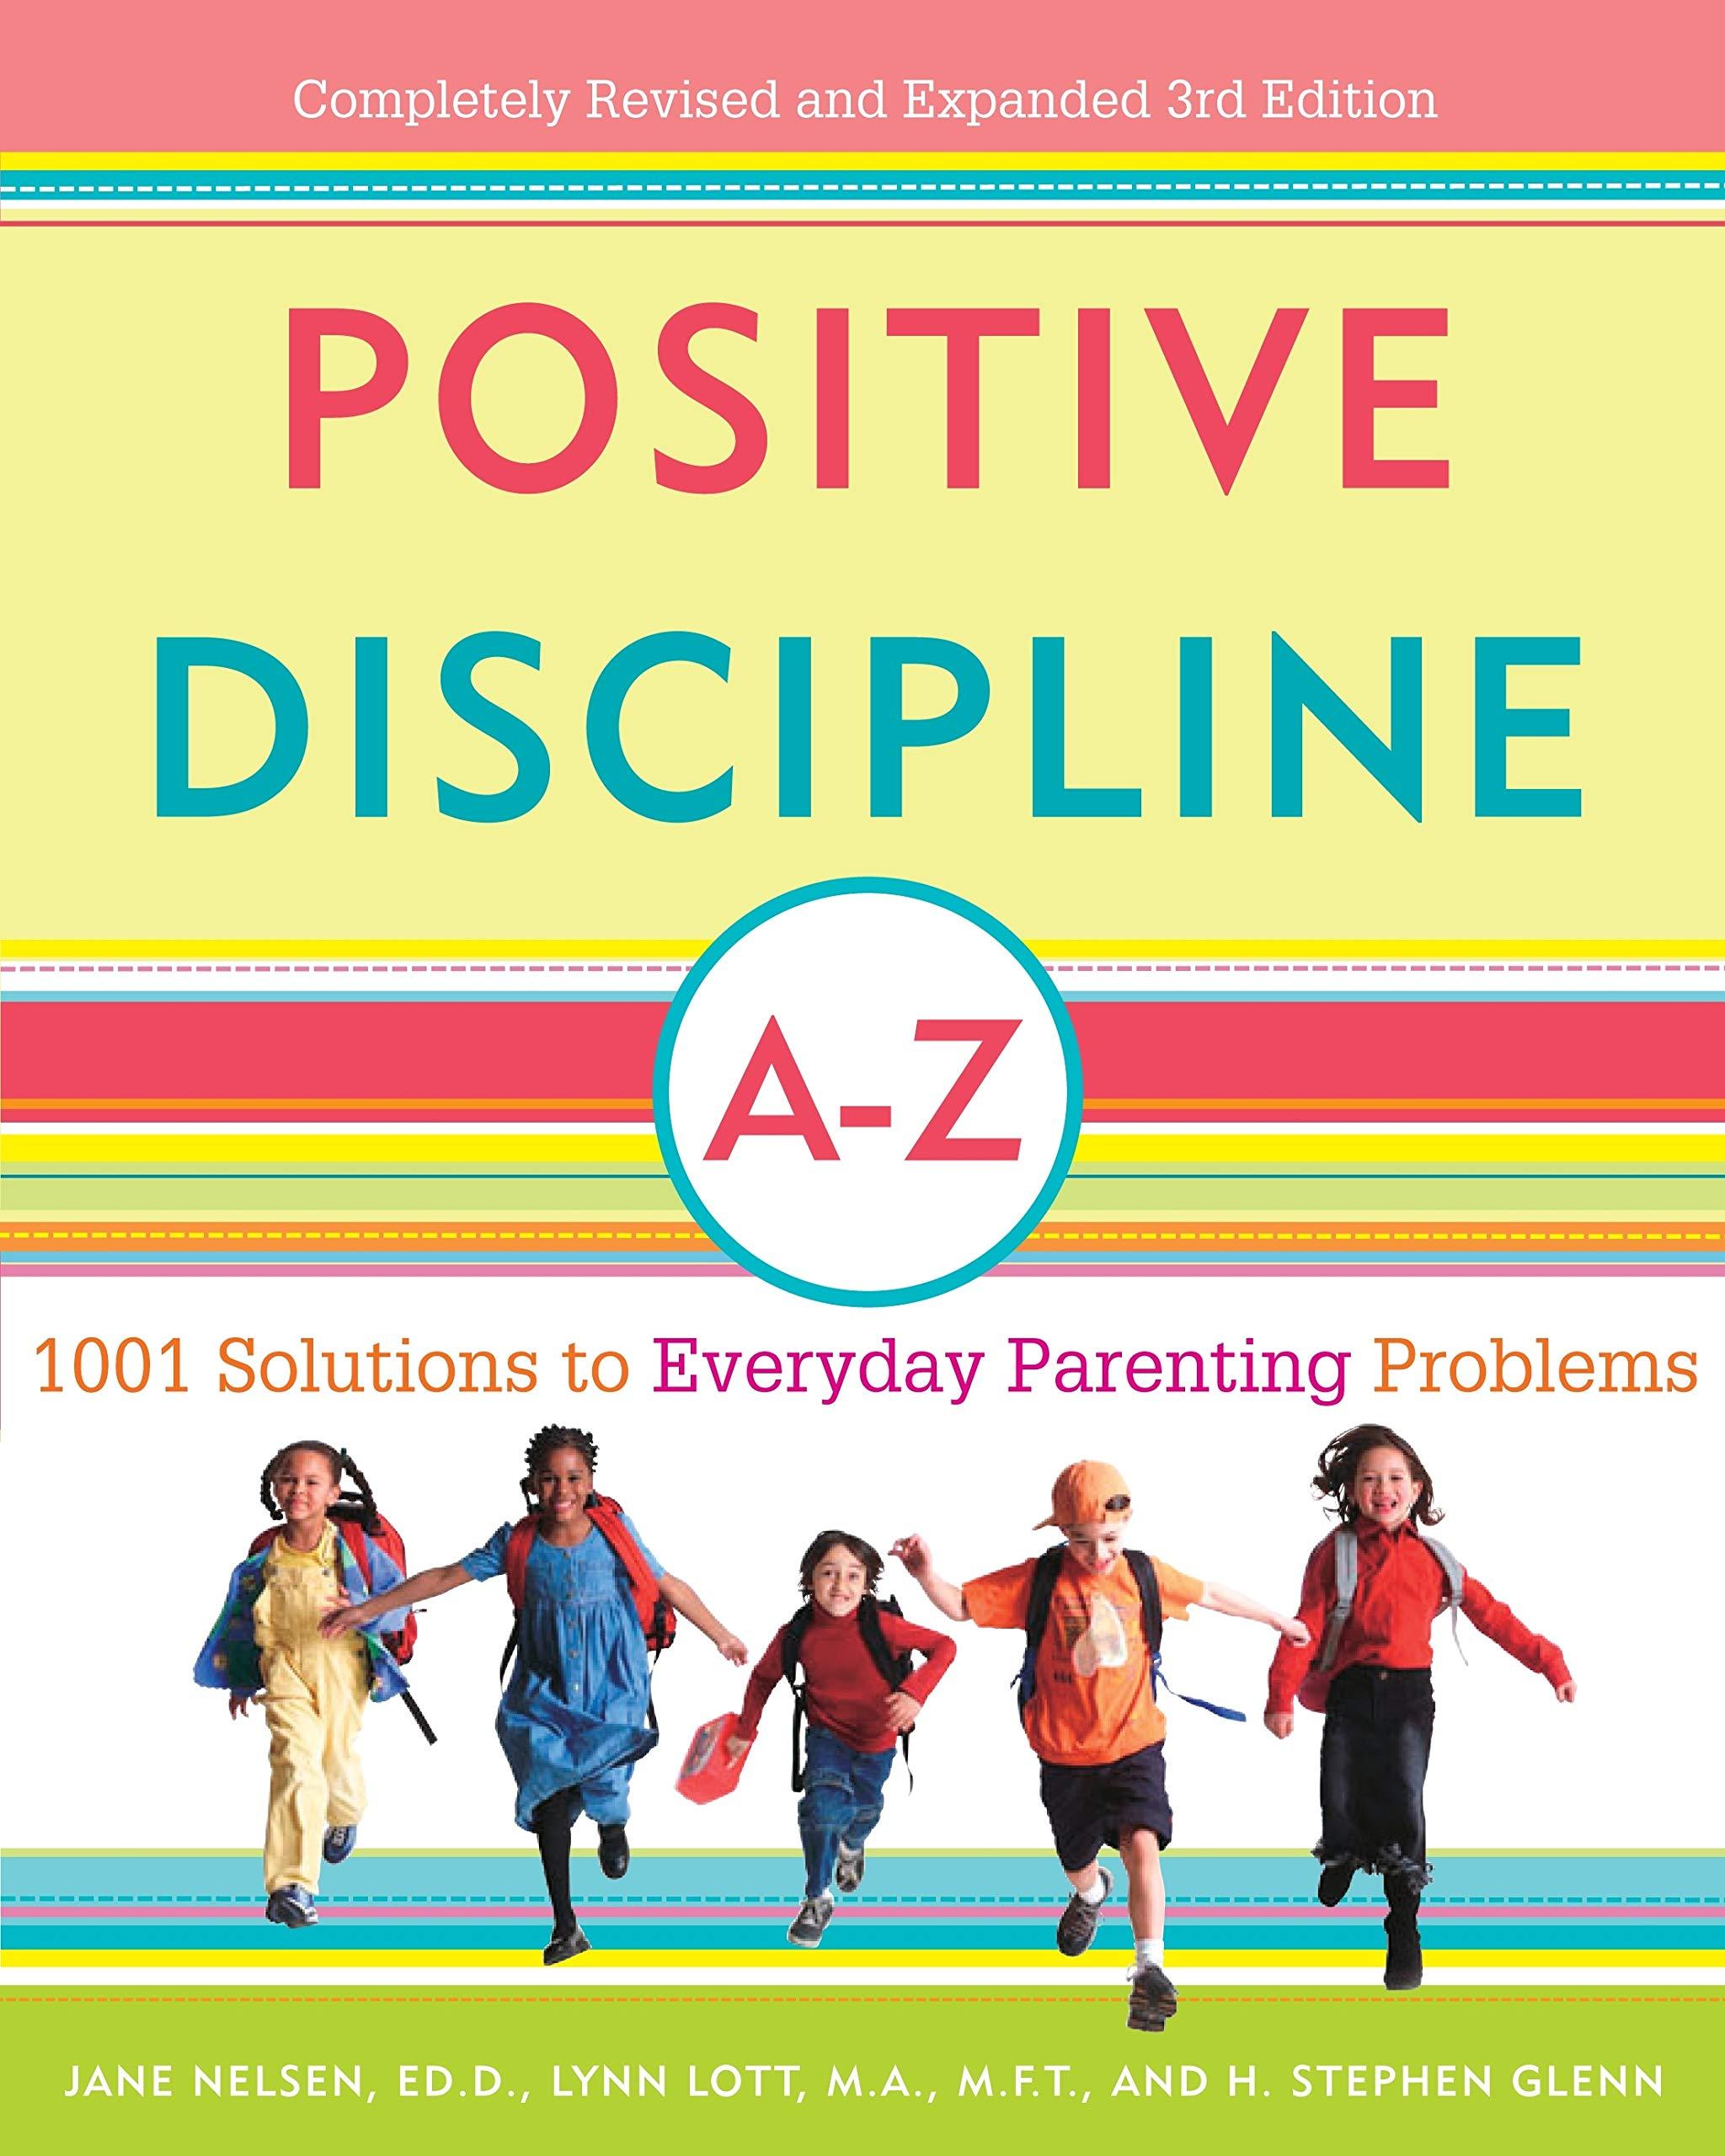 Positive Discipline A Z 1001 Solutions To Everyday Parenting Problems Positive Discipline Library Nelsen Ed D Jane Lott Lynn Glenn H Stephen 9780307345578 Amazon Com Books